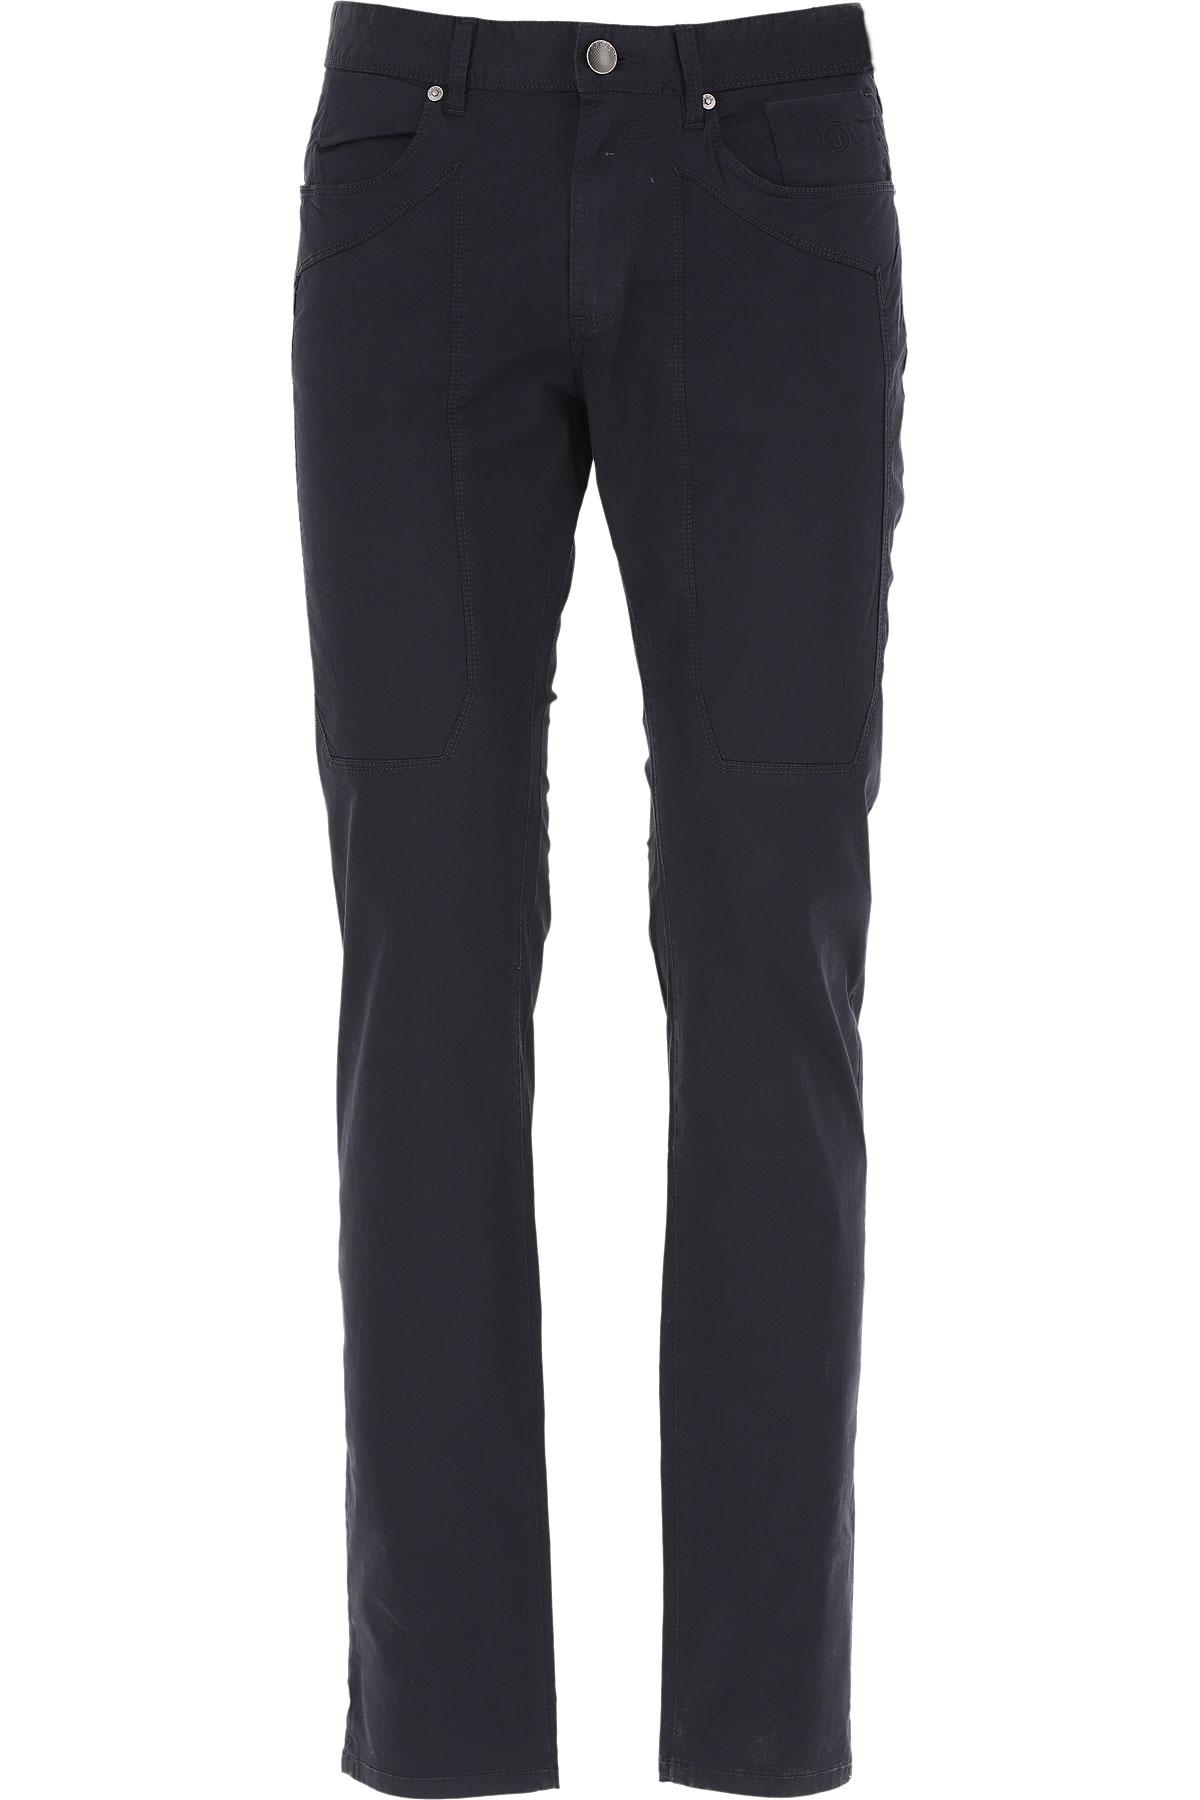 Jeckerson Pants for Men On Sale, Midnight Blue, Cotton, 2019, 30 31 32 33 34 35 36 38